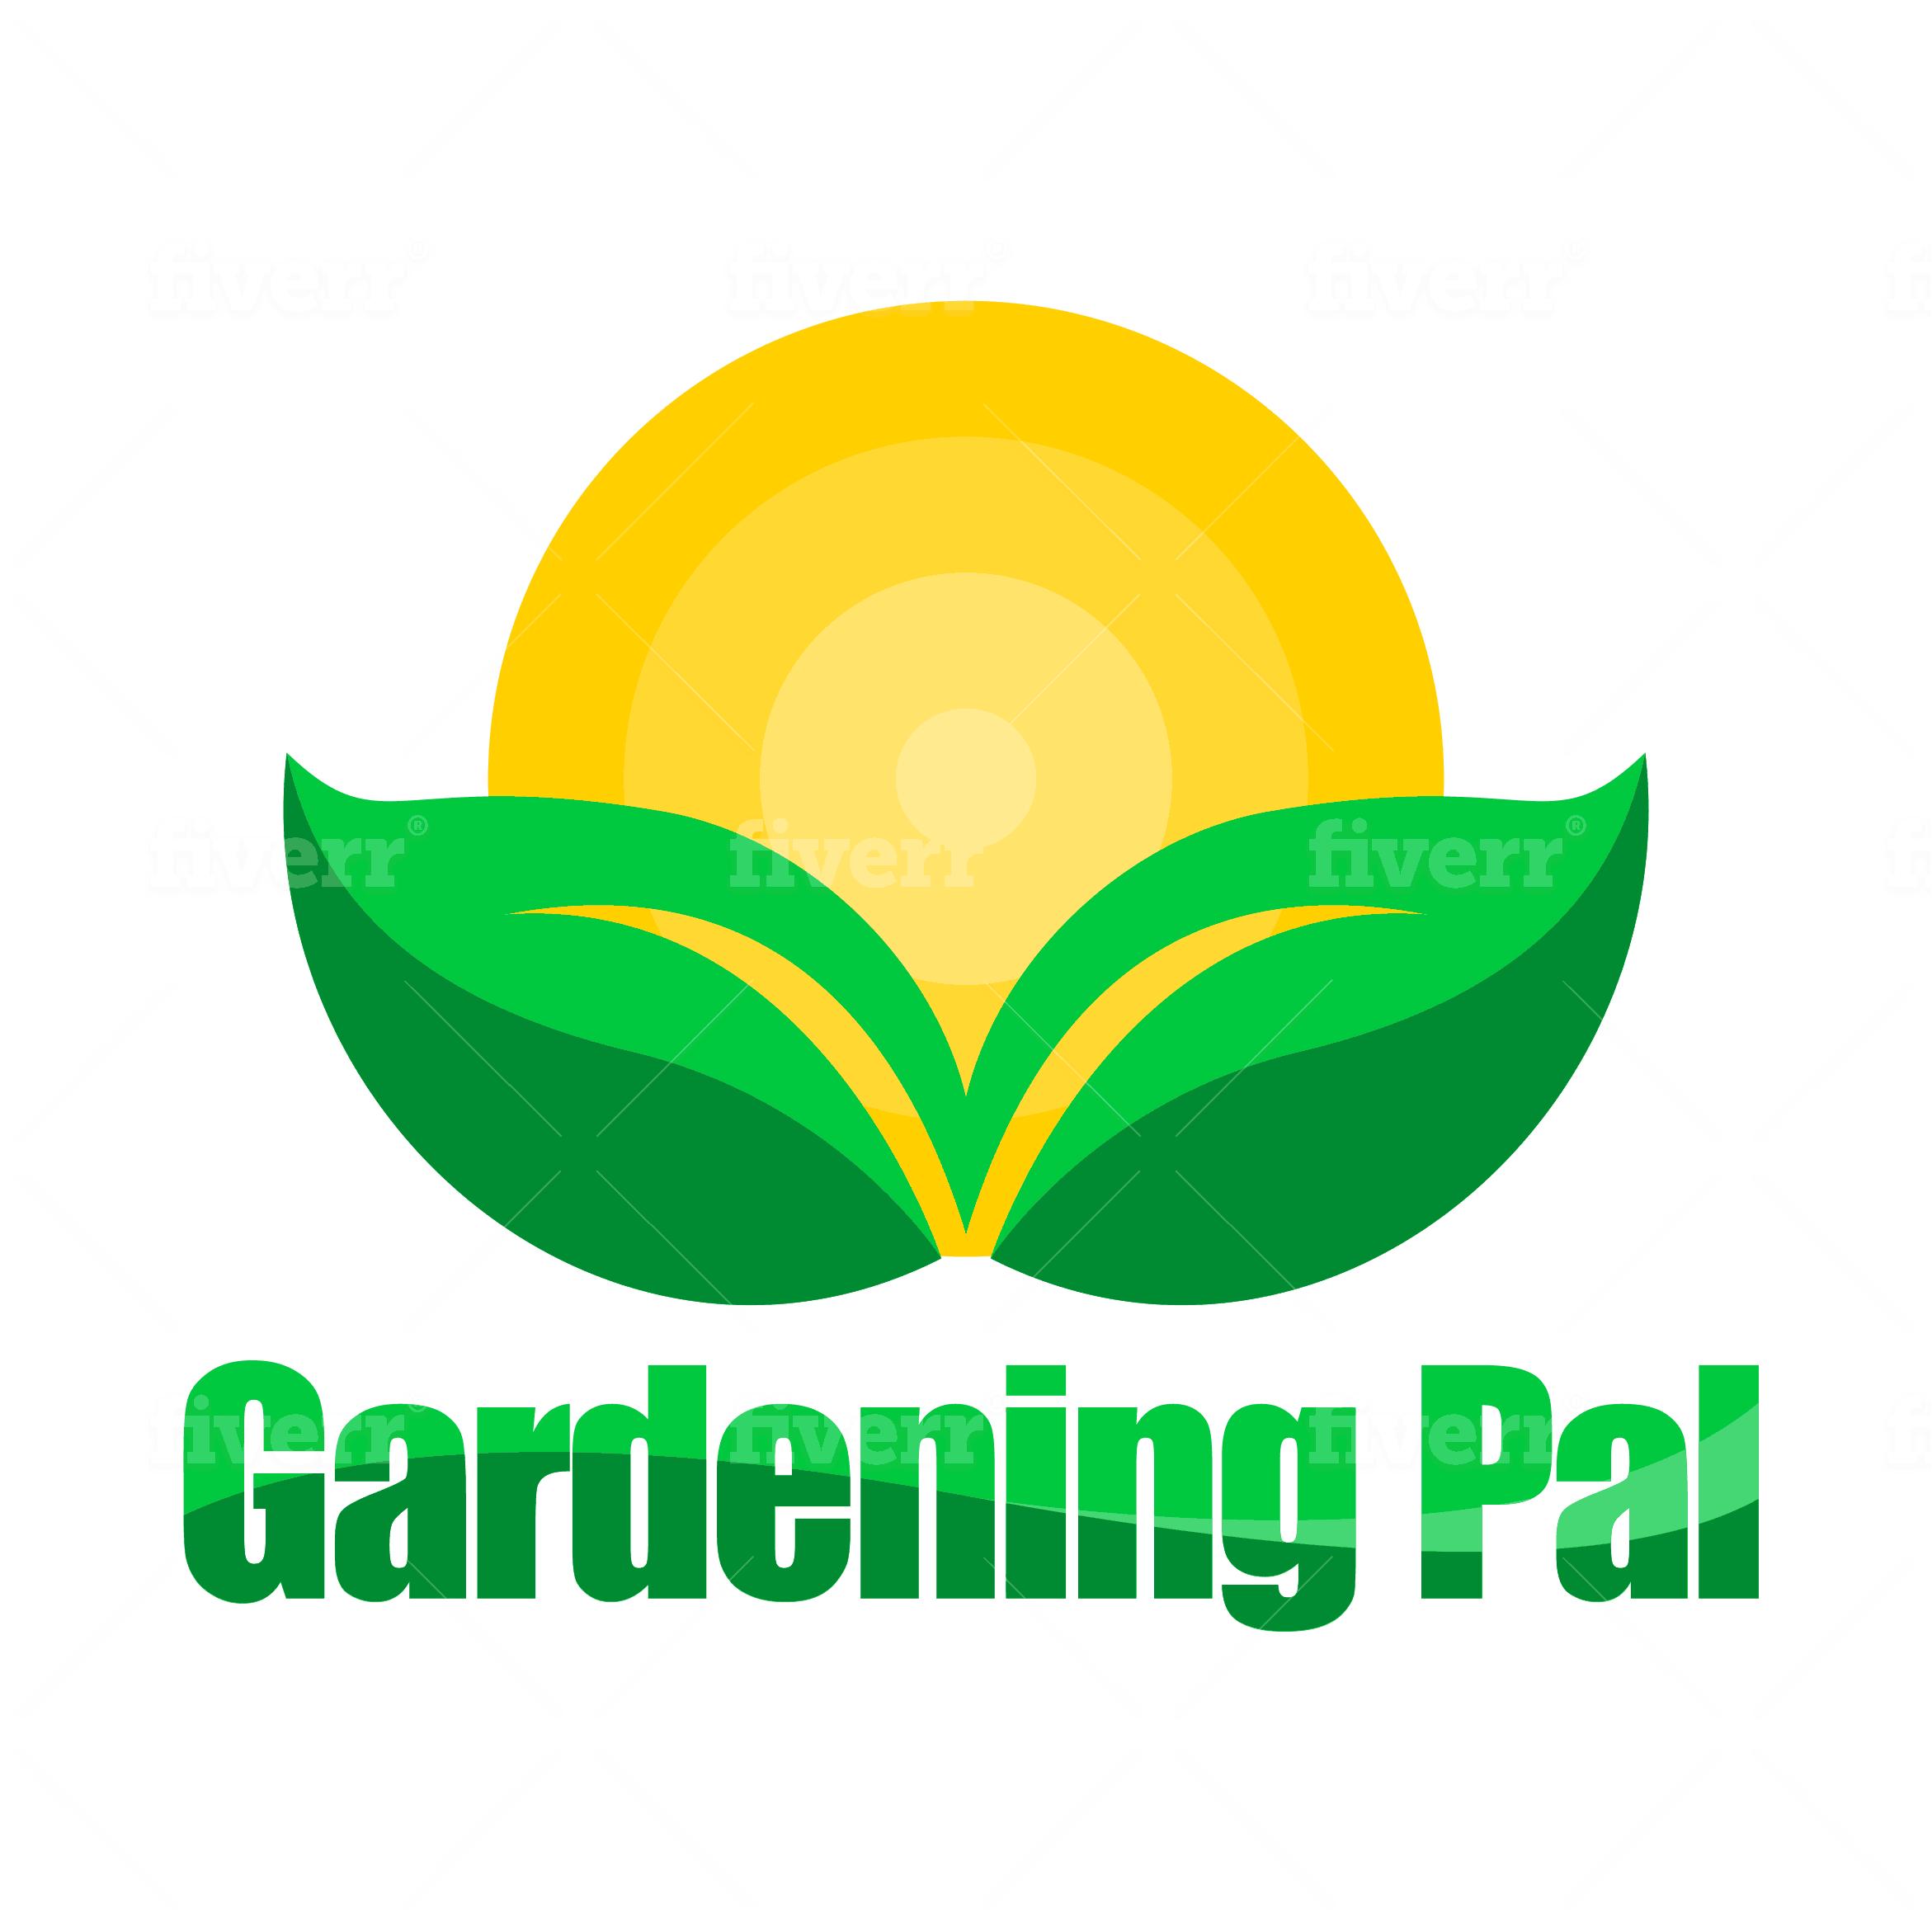 The Gardening Pal